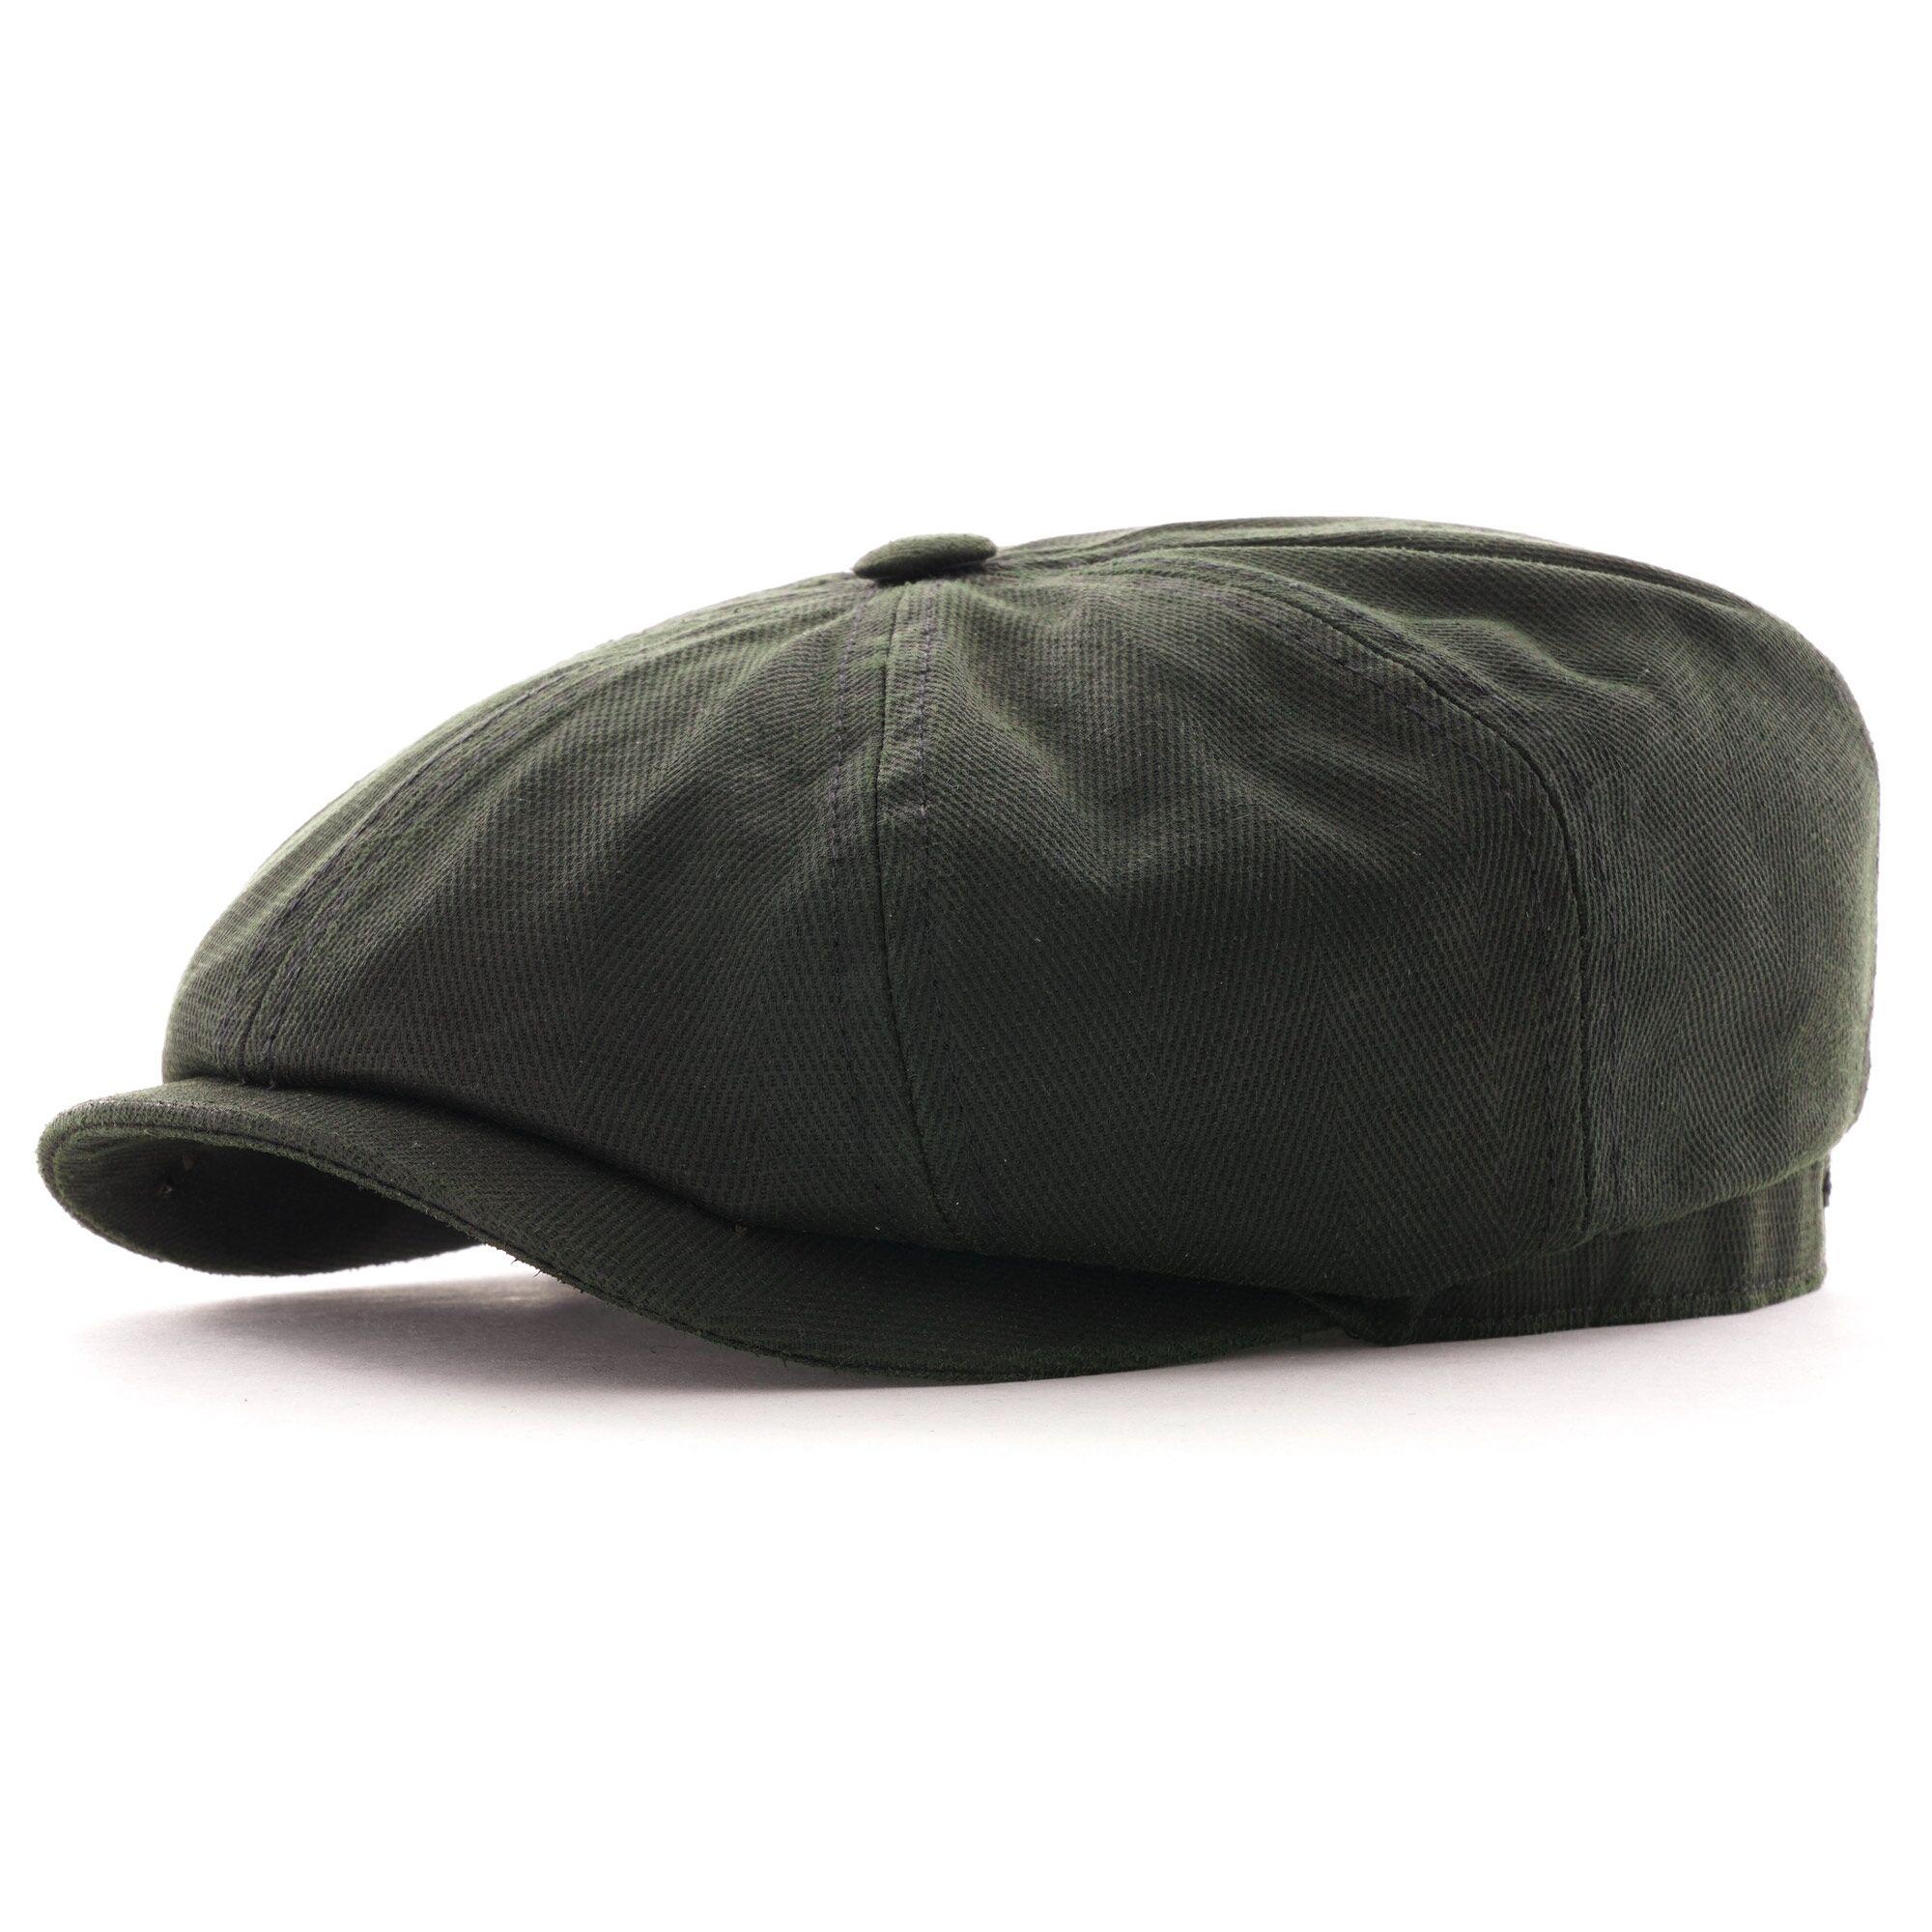 Stetson Hats Hatteras Cotton-Mix Flat Cap   Khaki   6841509-341